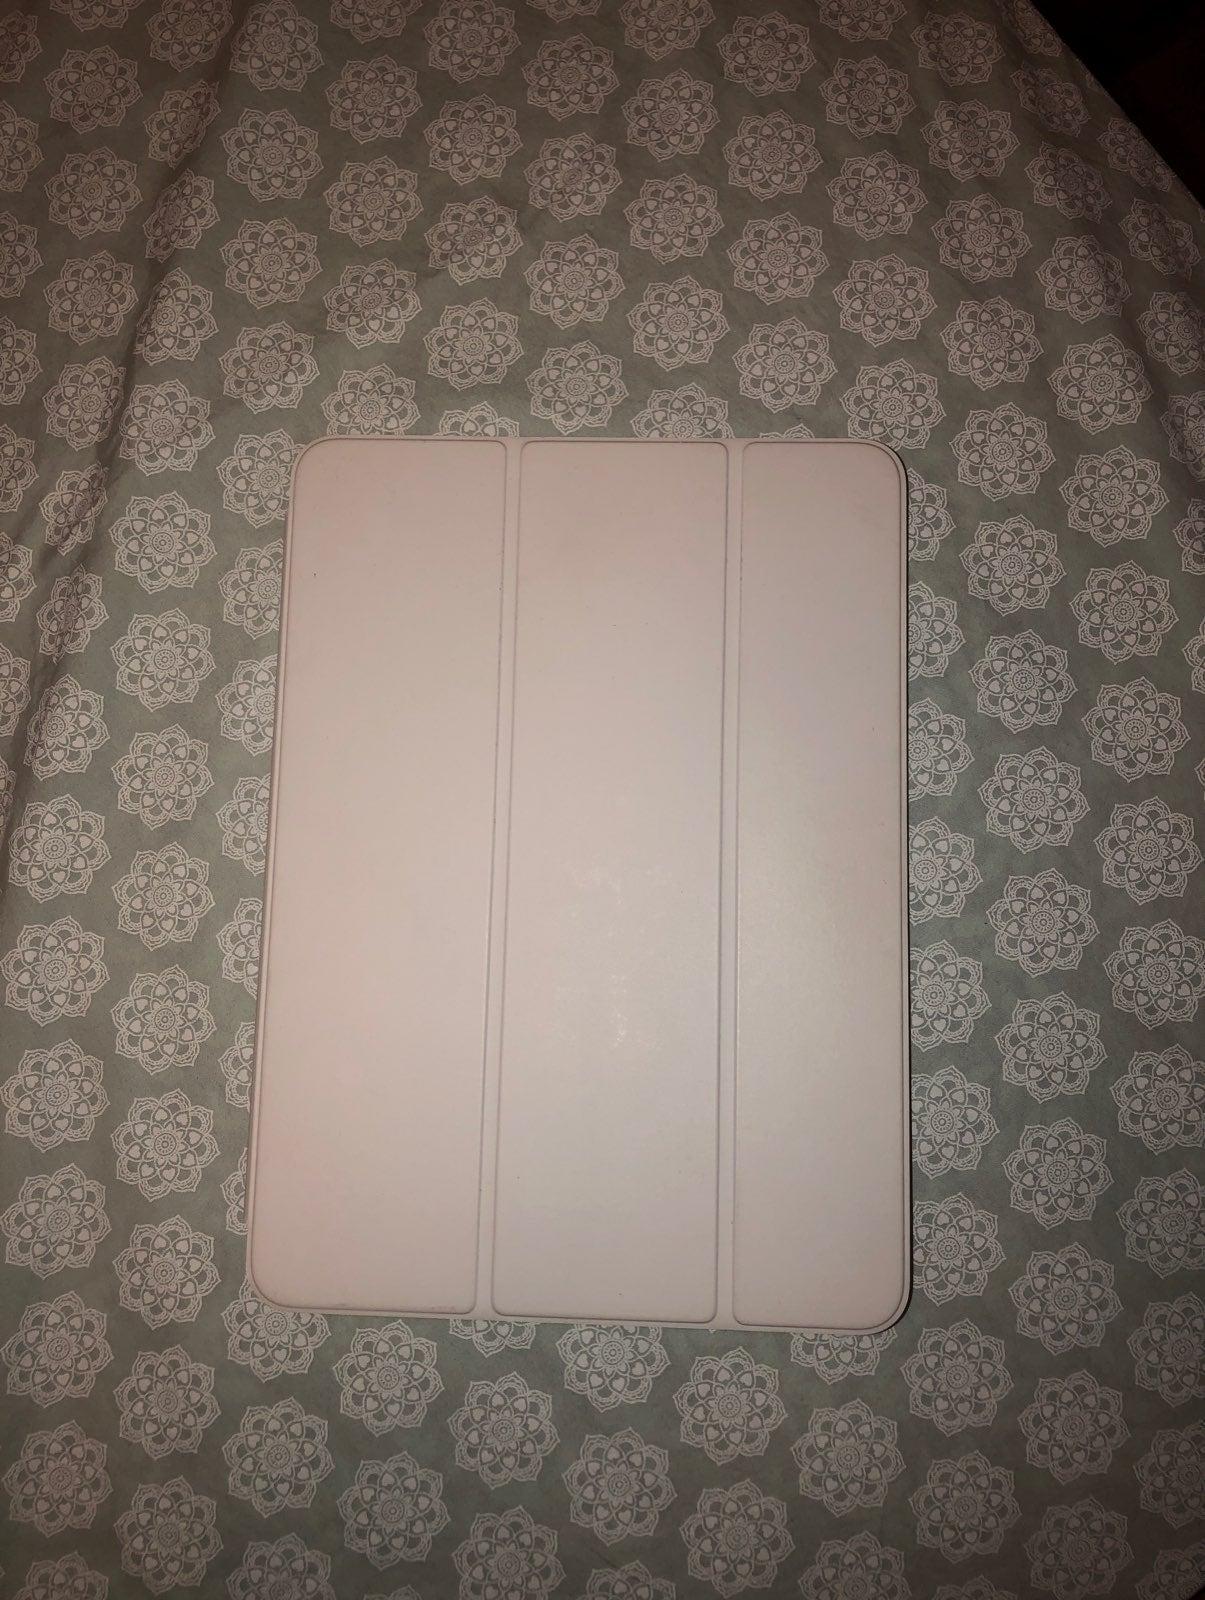 iPad Pro 11 inch Smart Folio